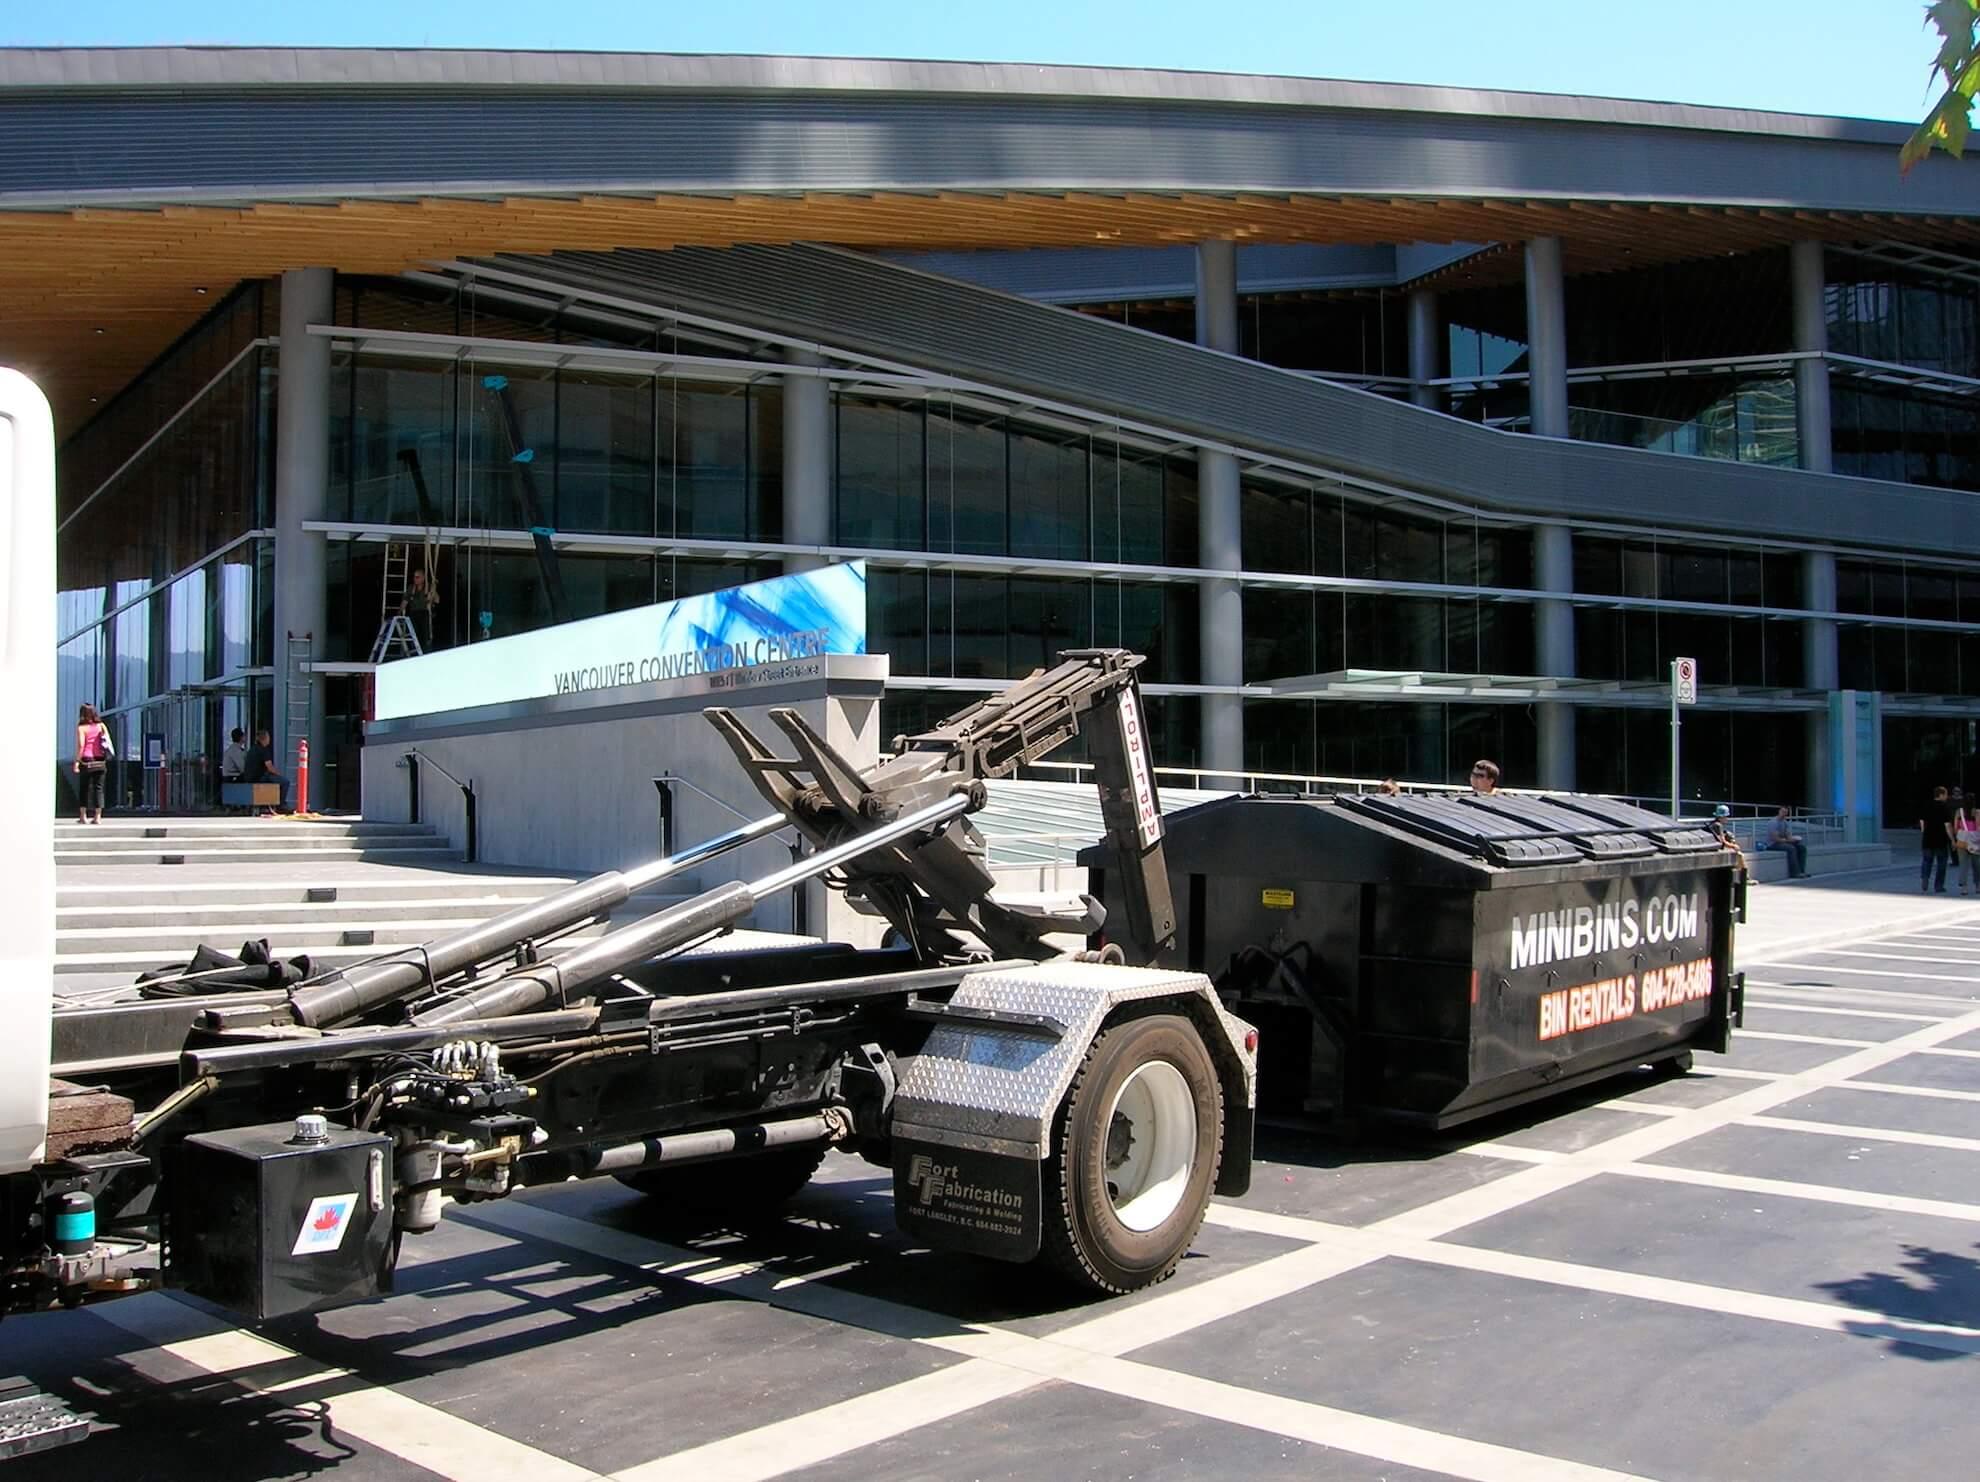 Minibins Truck commercial dumpster rental Vancouver